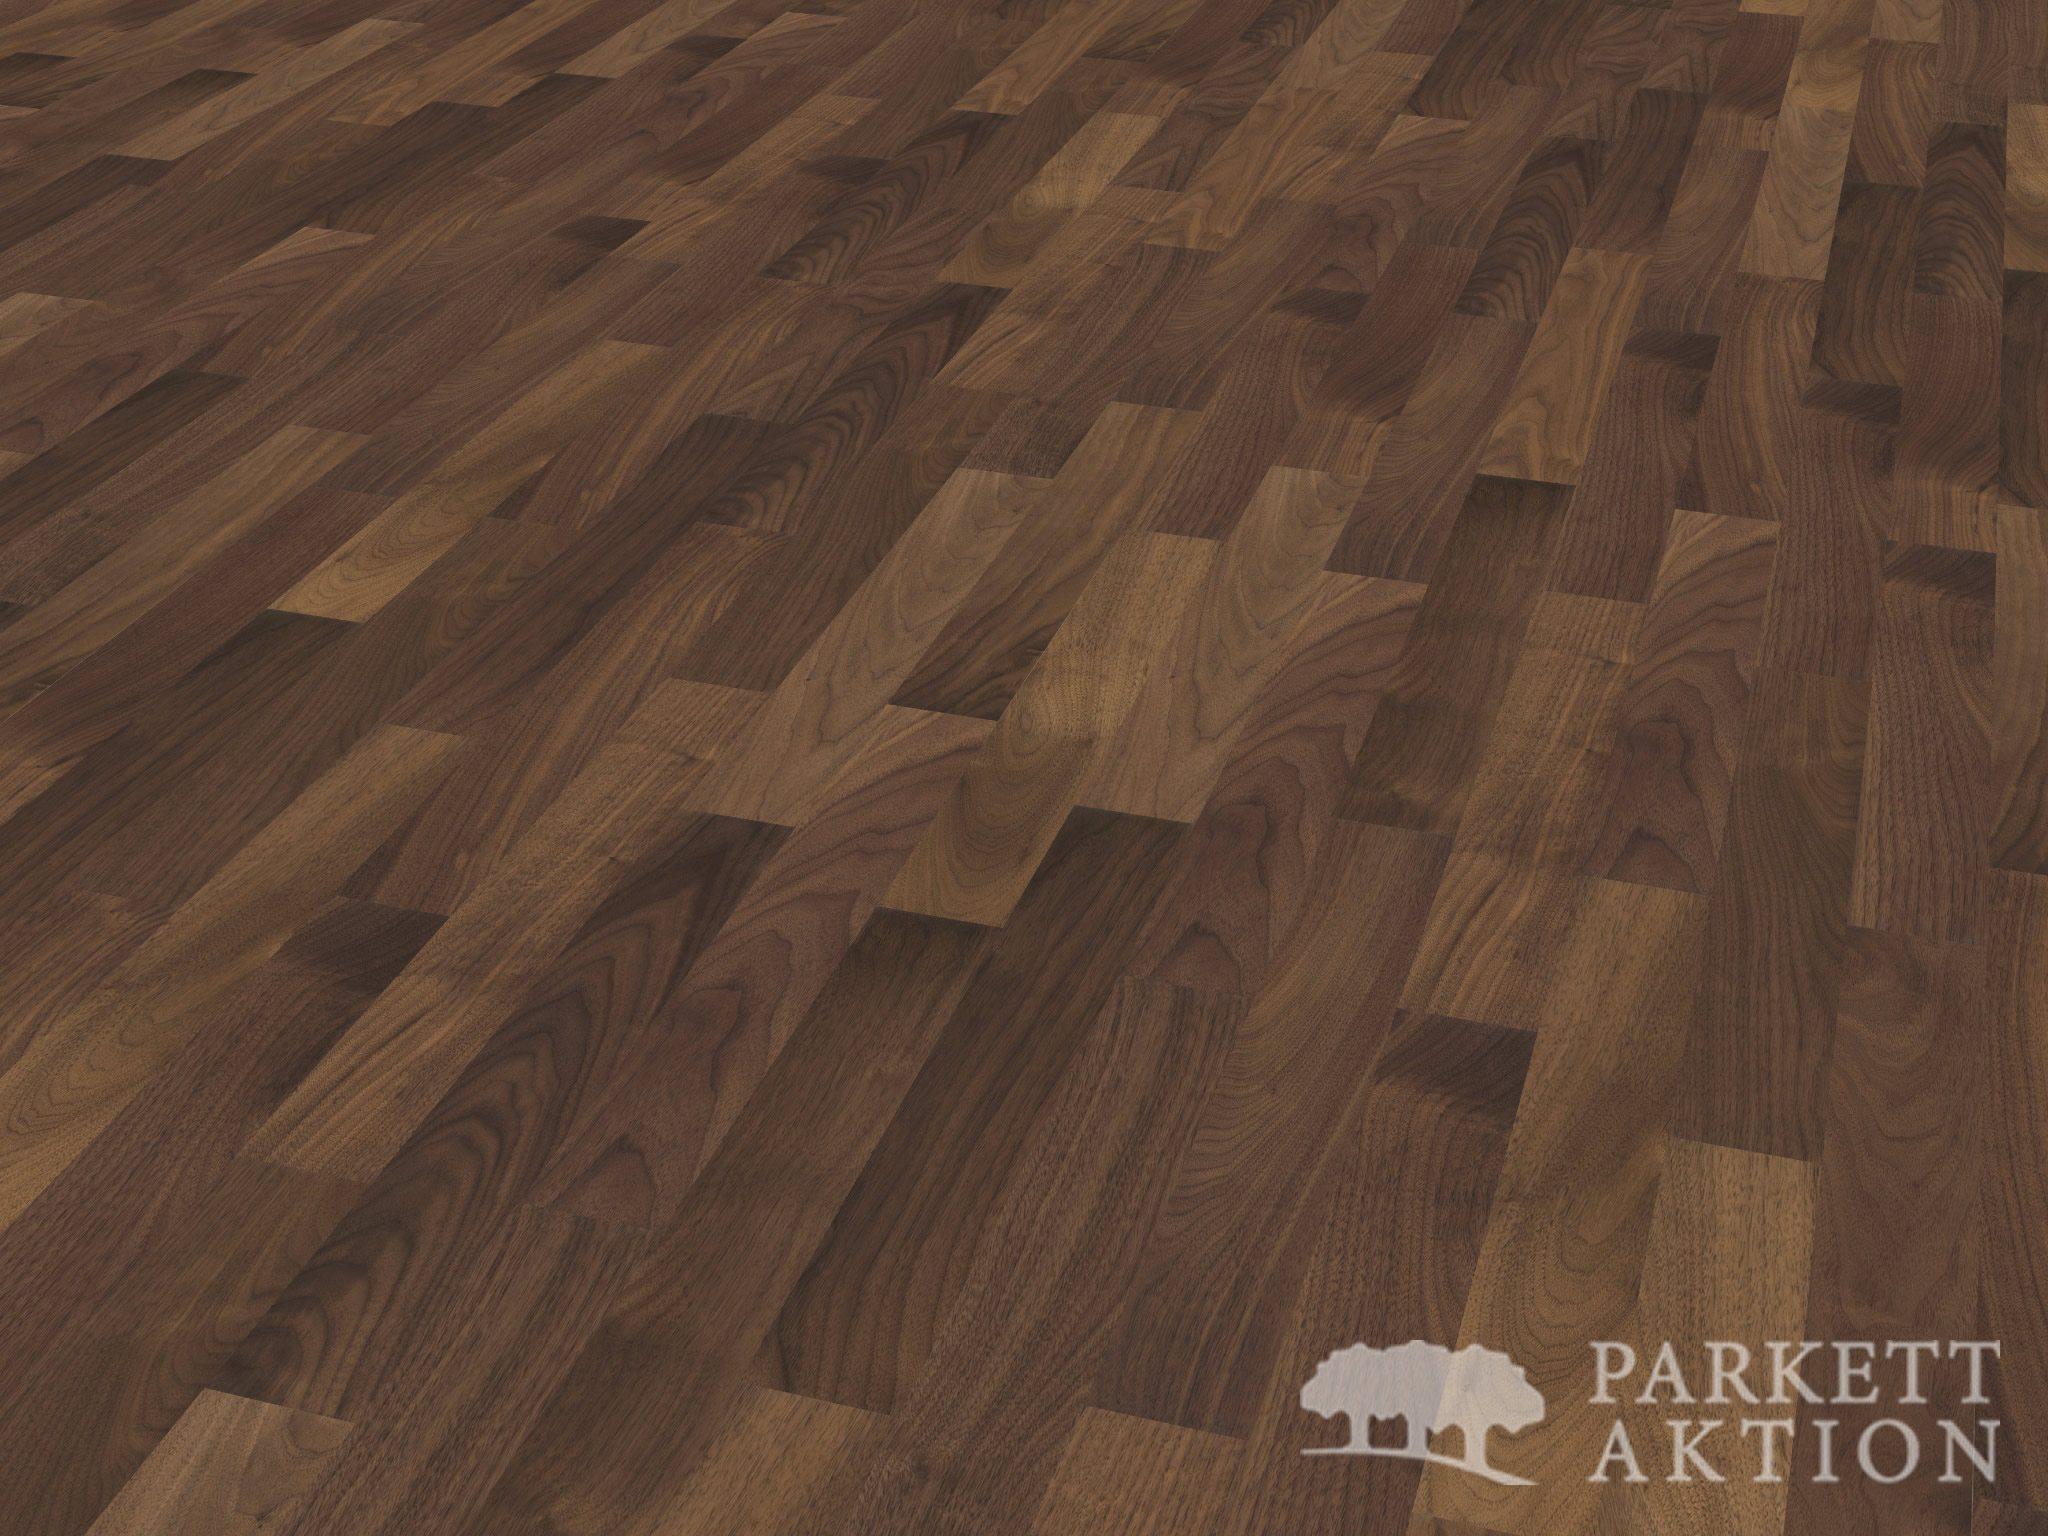 2 schicht parkett nussbaum natur lackiert li parkett. Black Bedroom Furniture Sets. Home Design Ideas